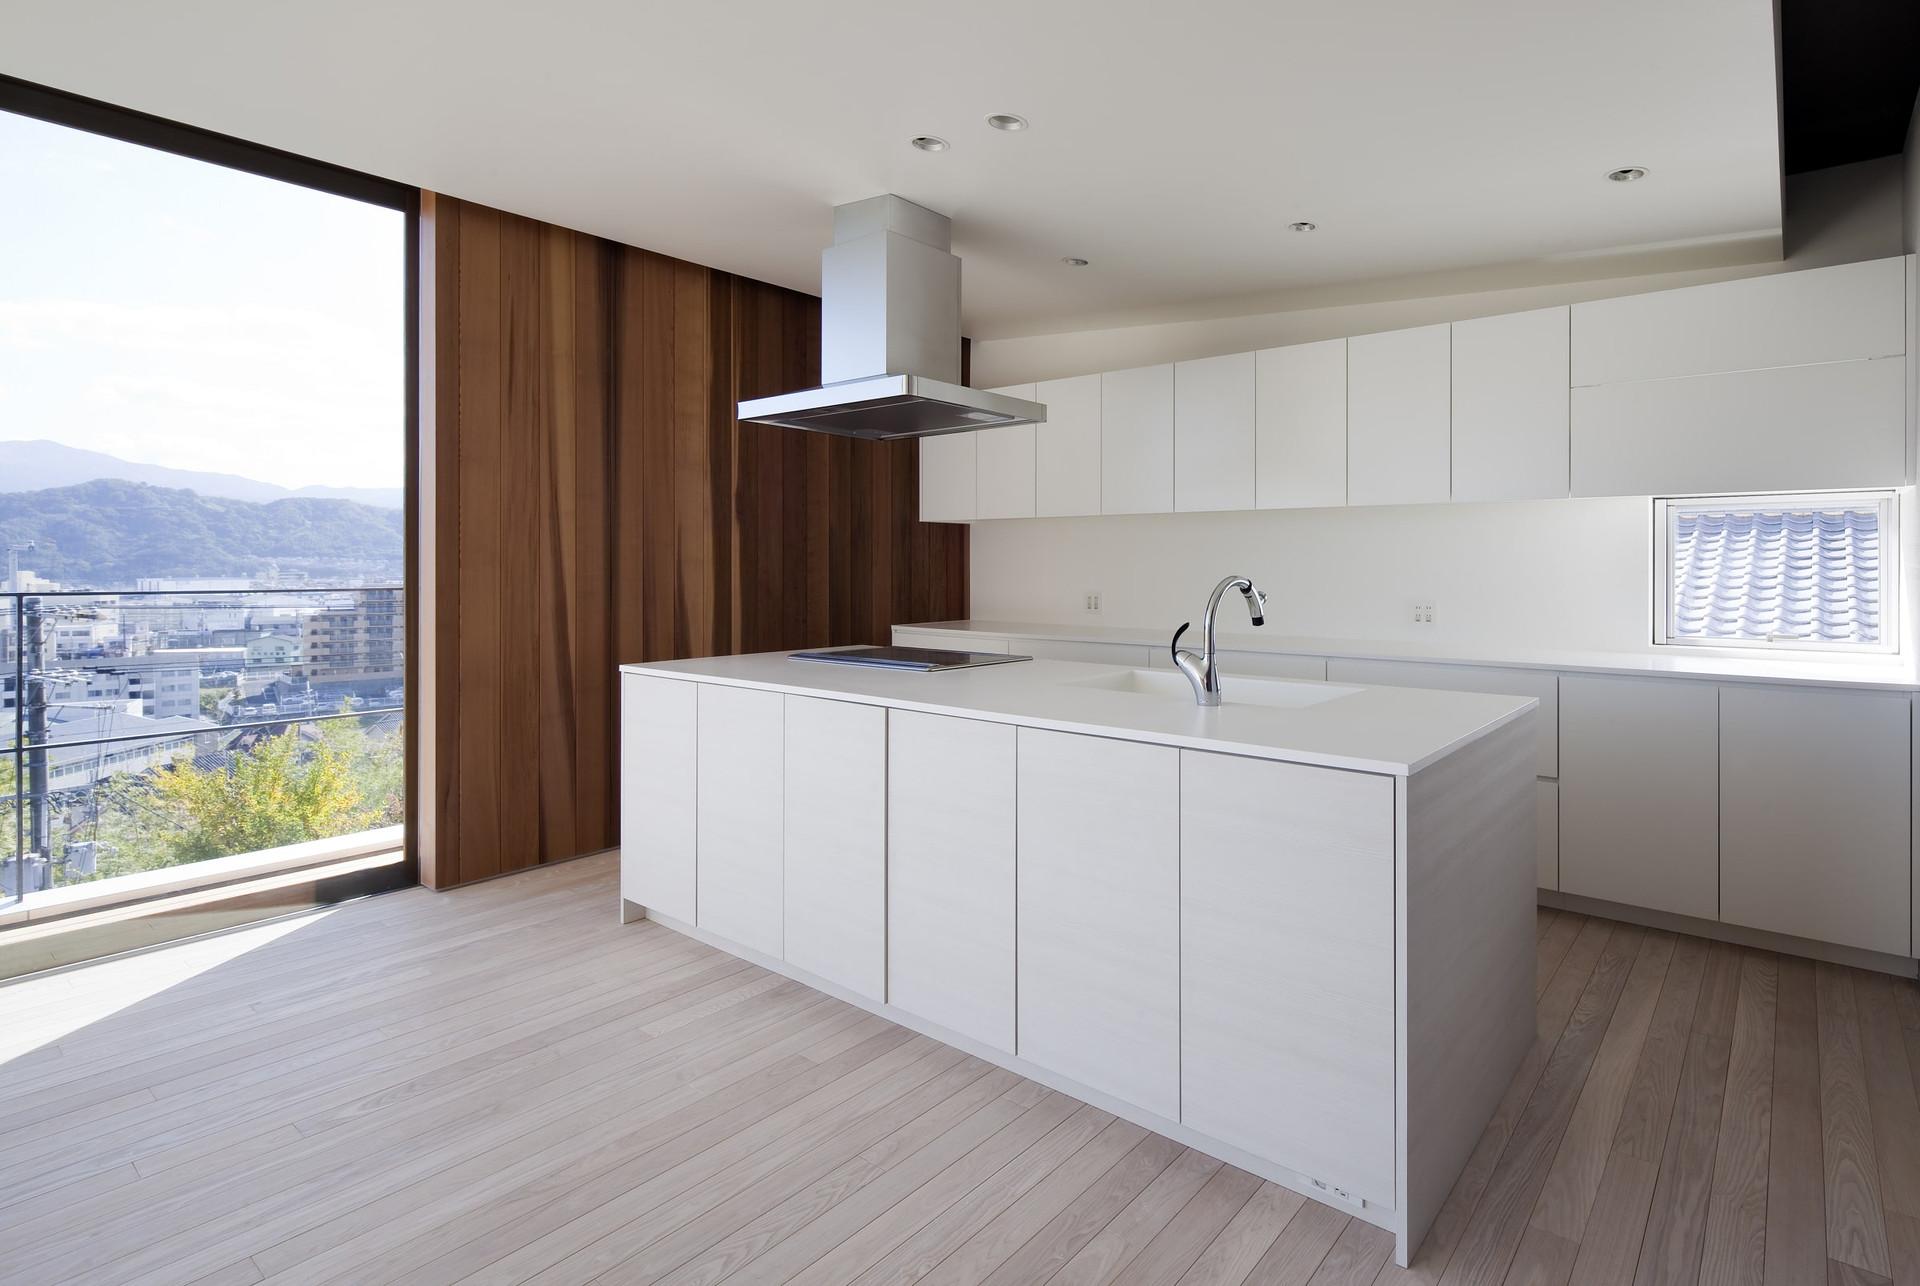 architect-office-hill-house-2400_12.jpg